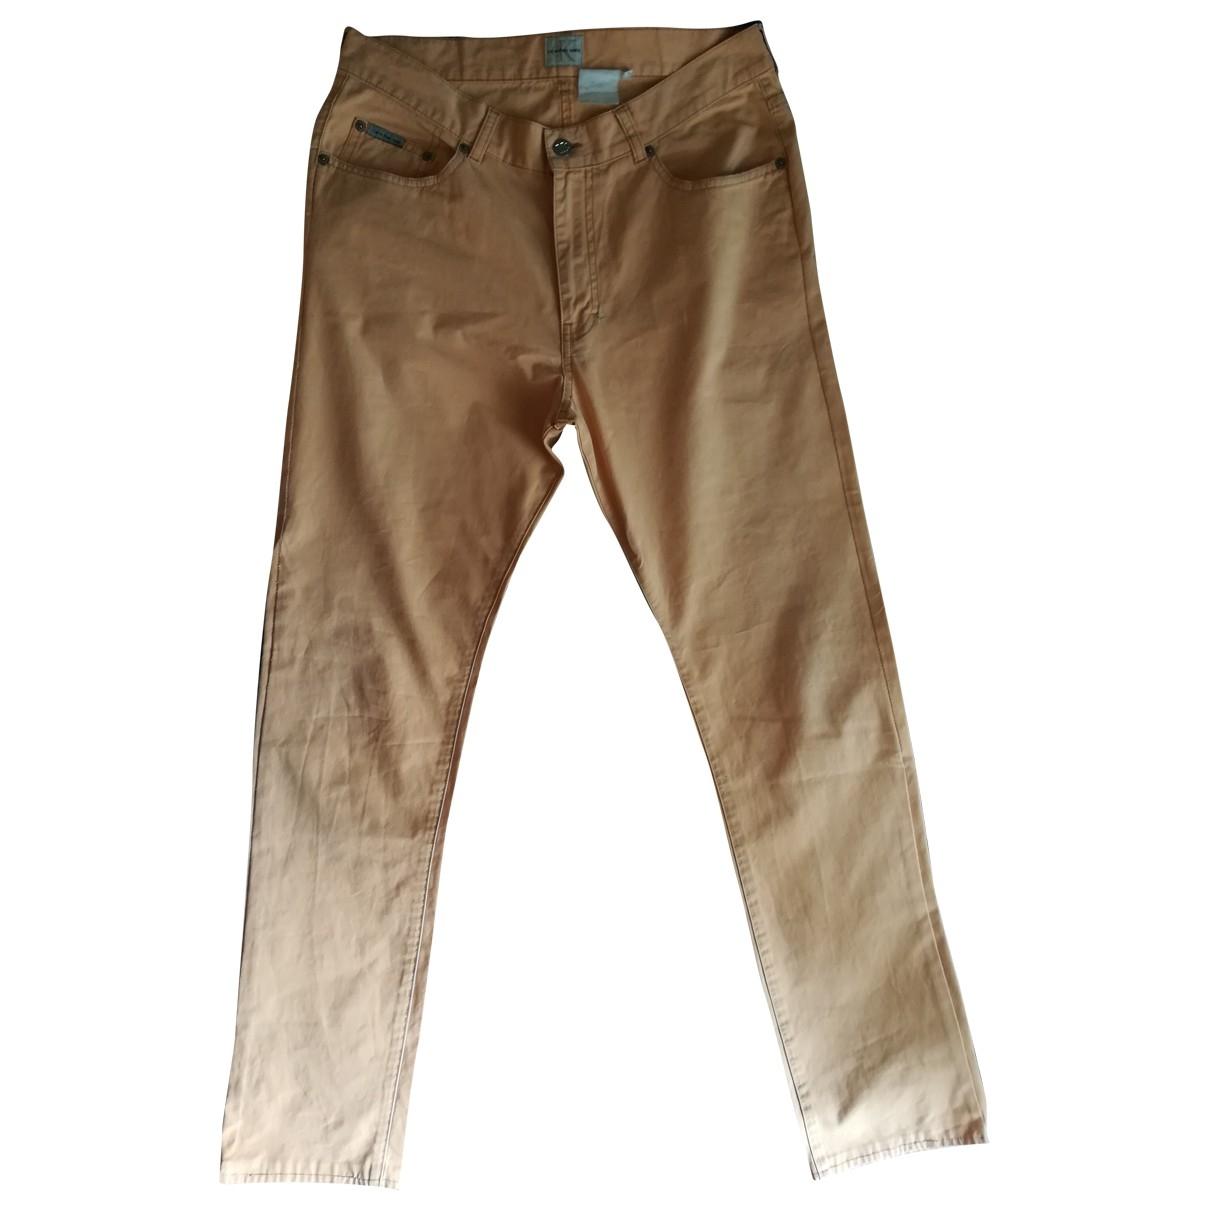 Calvin Klein \N Cotton Trousers for Men S International